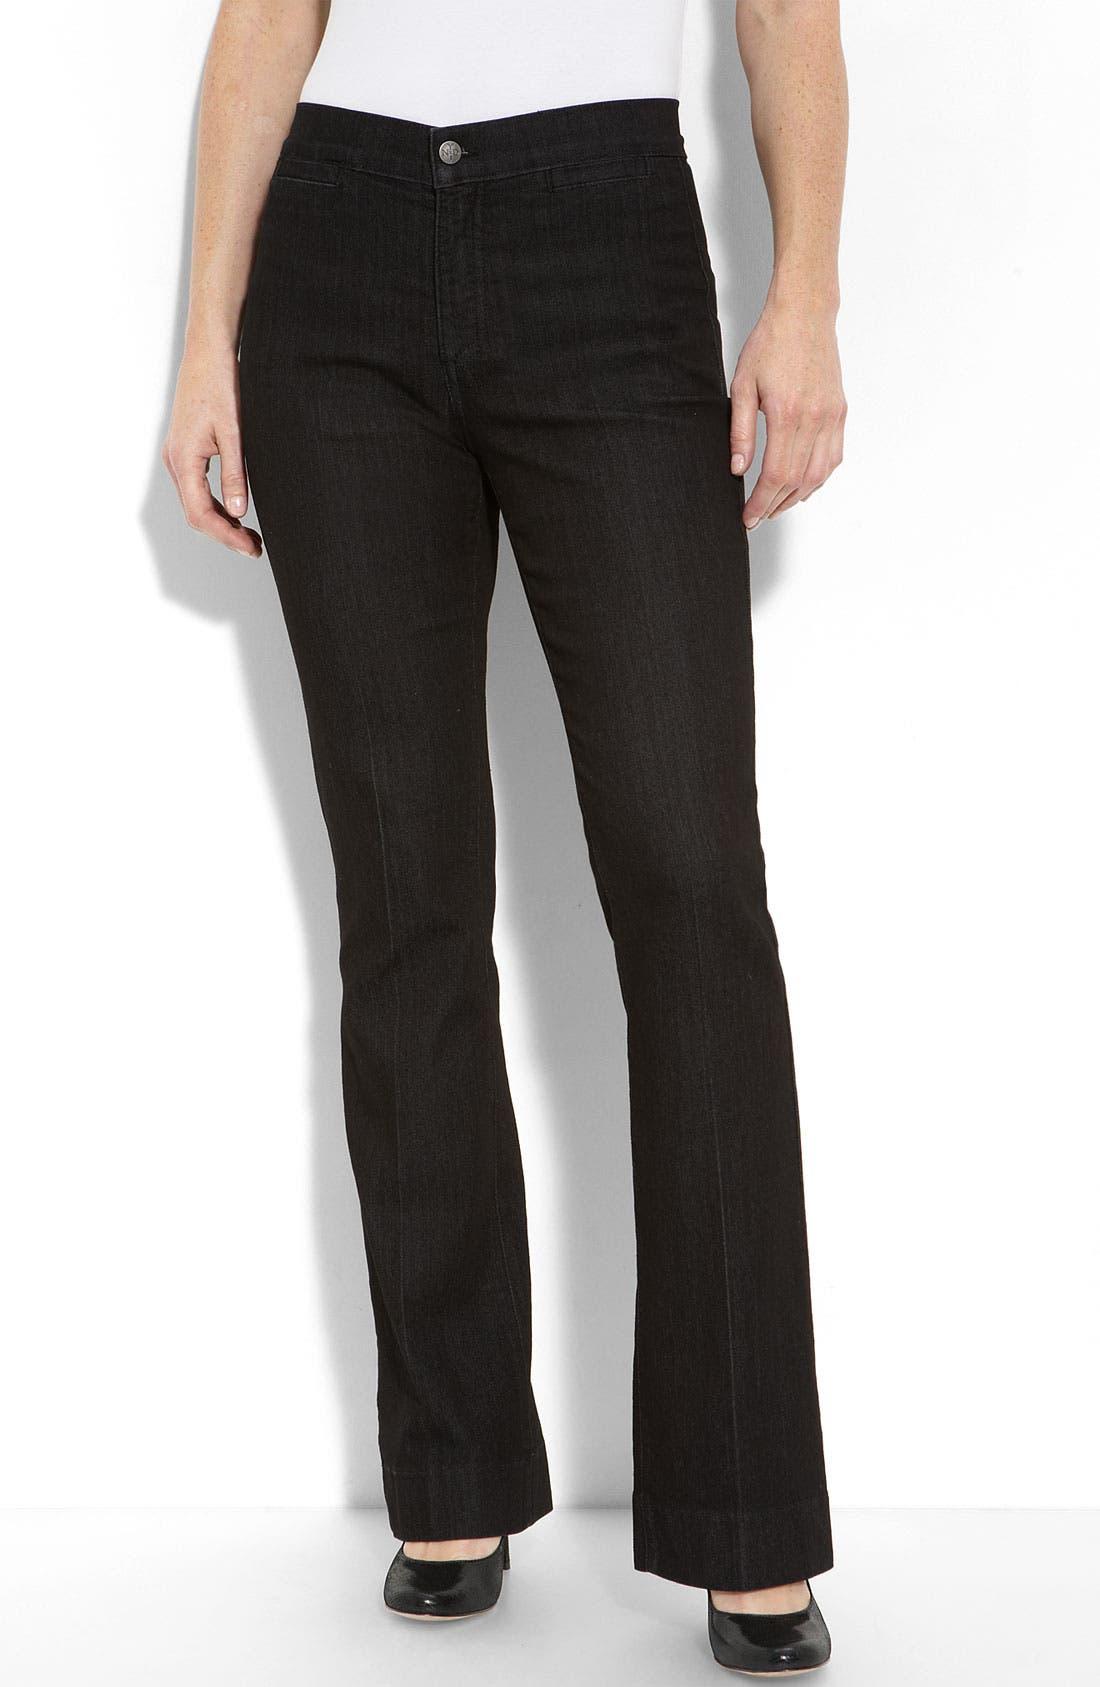 Main Image - NYDJ 'Michelle' Trouser Jeans (Petite)